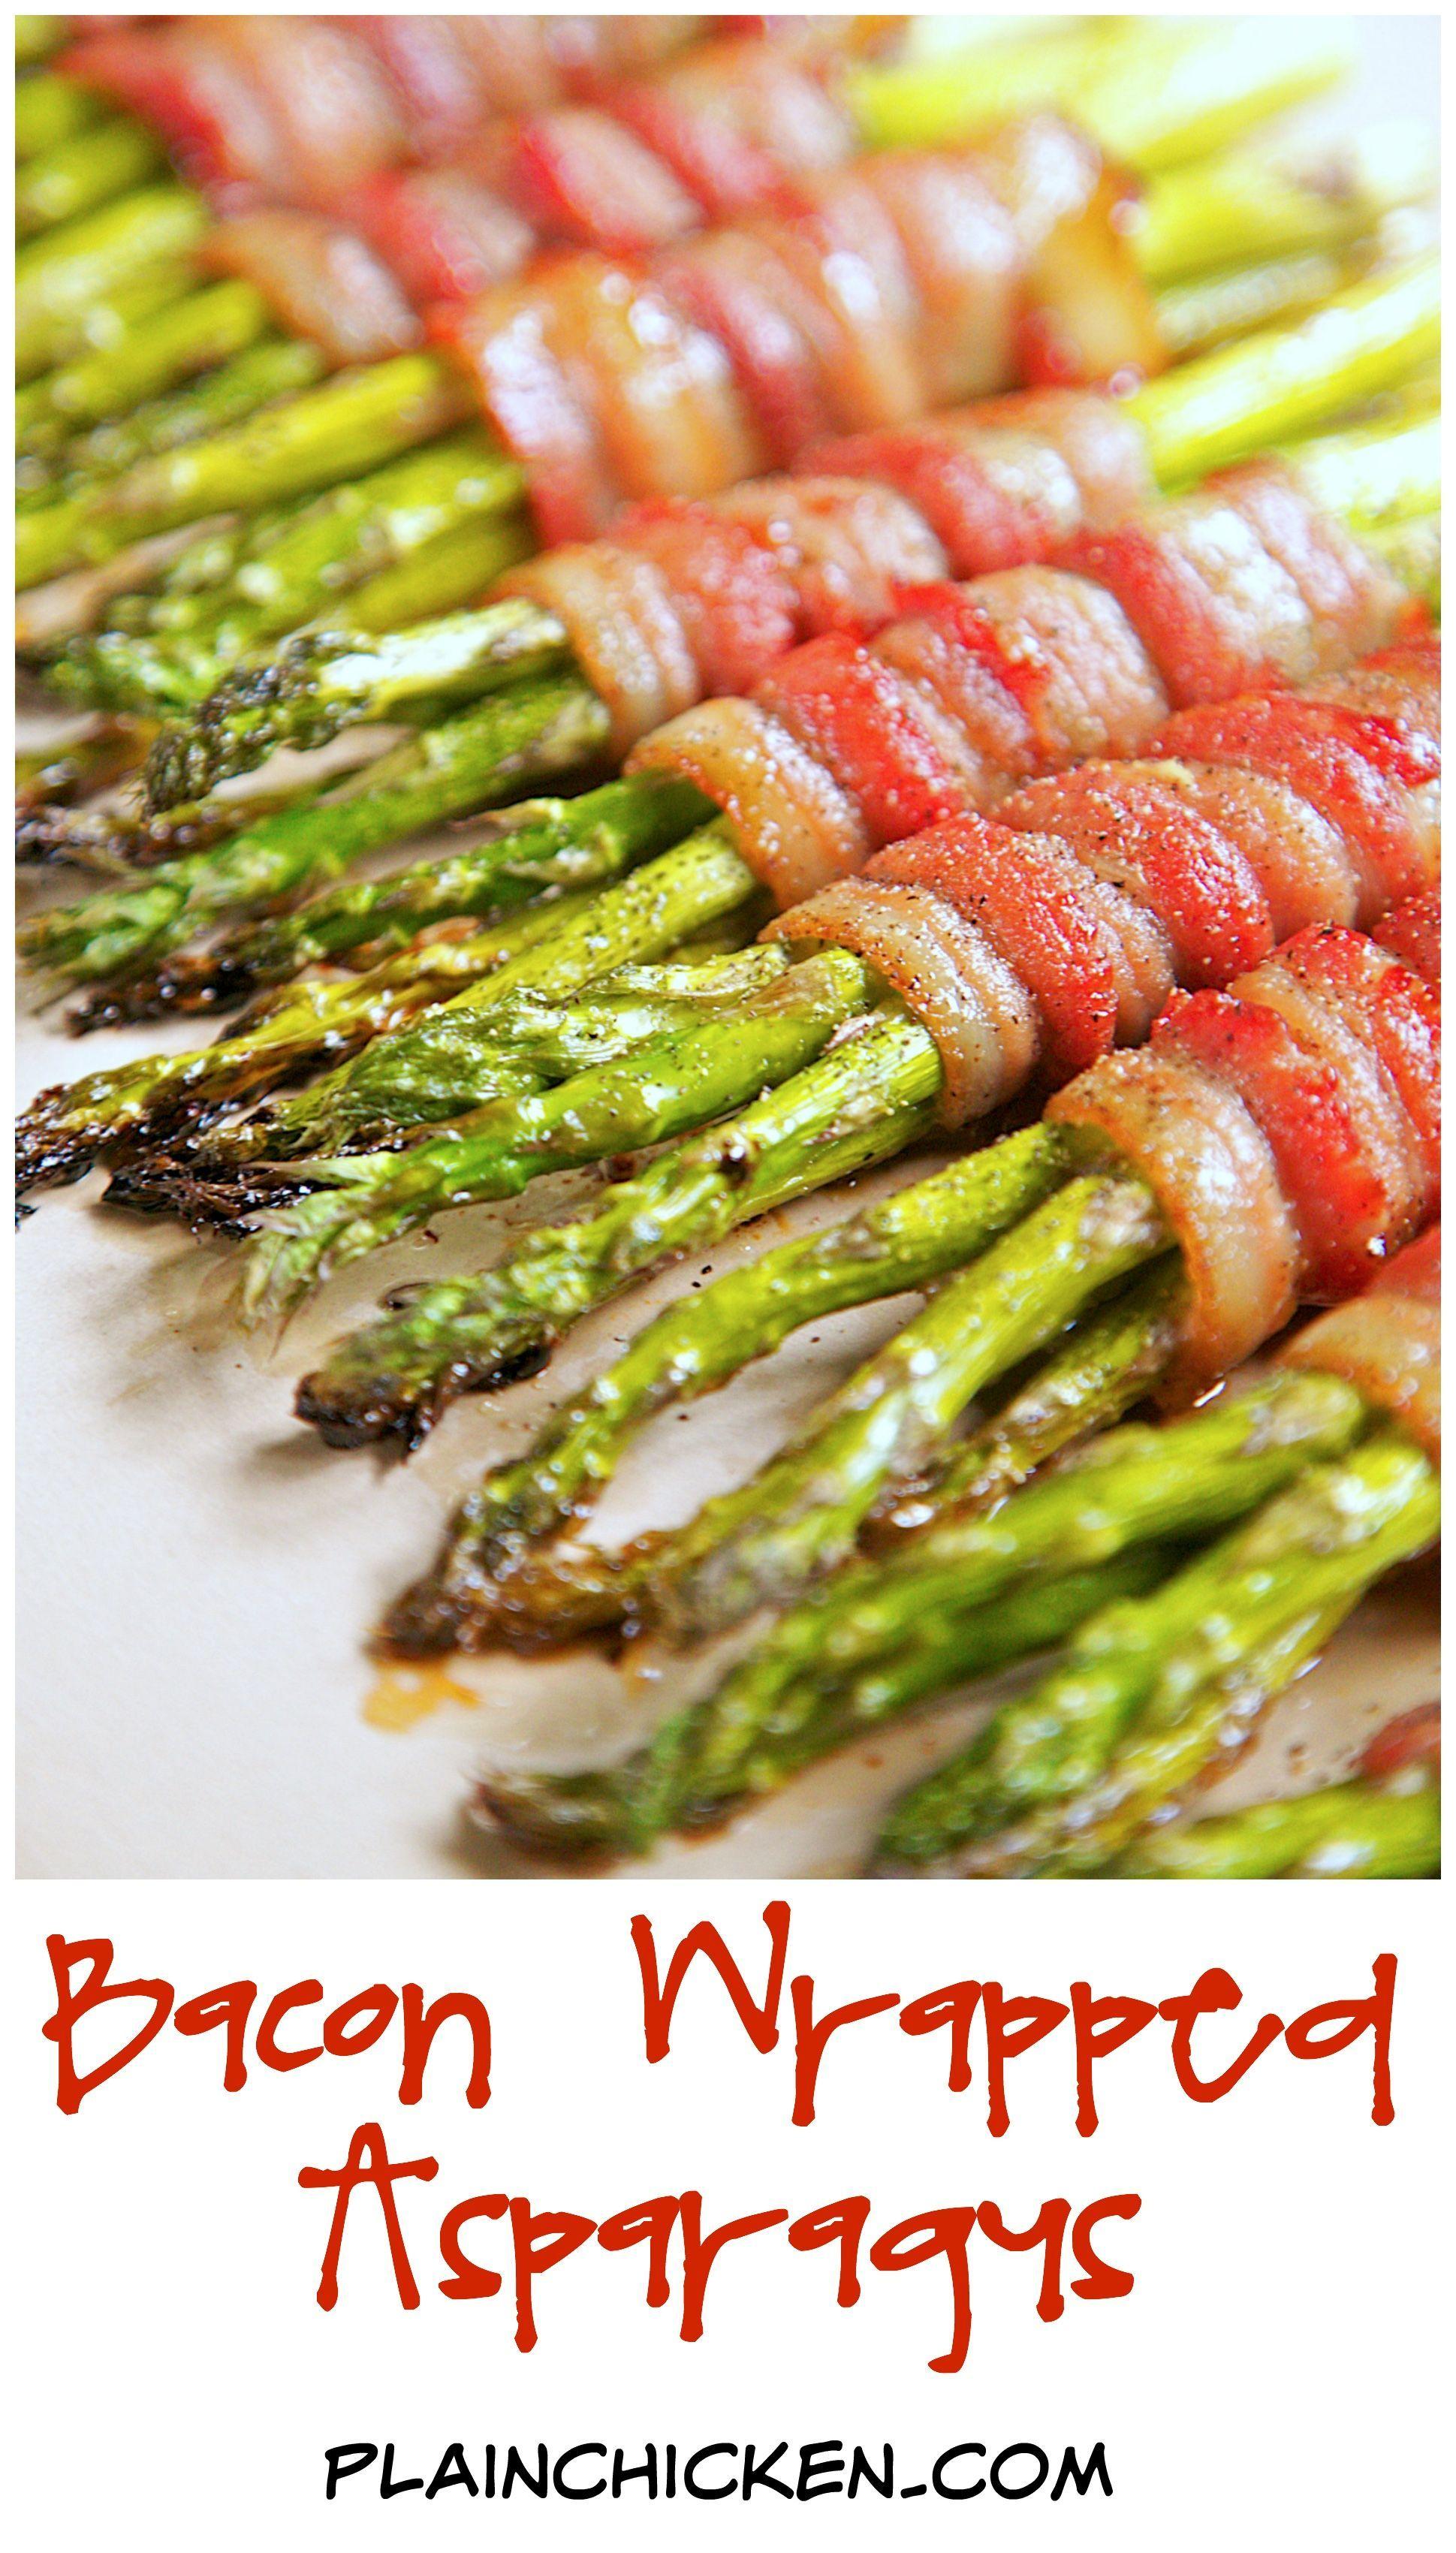 Bacon Wrapped Asparagus Recipe Fresh Asparagus Wrapped